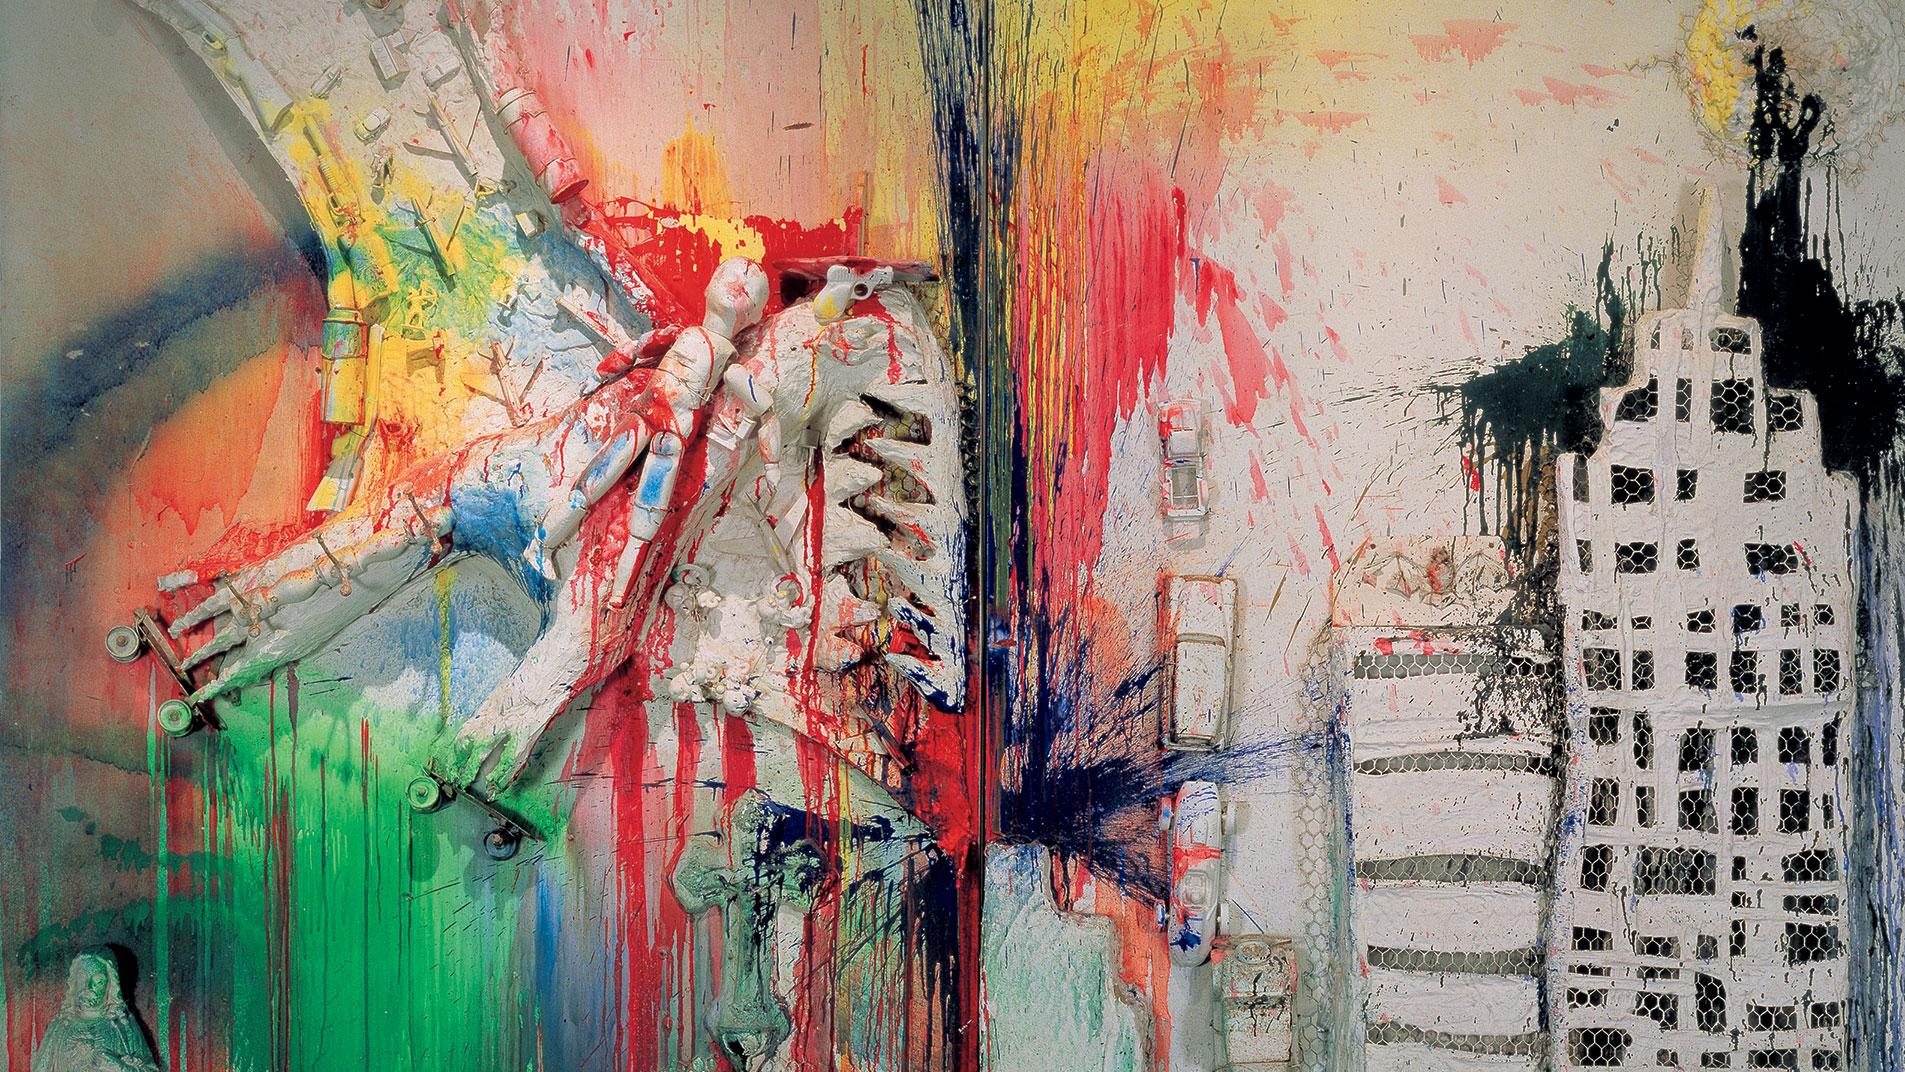 Detail: Niki de Saint Phalle, Pirodactyl Over New York, 1962